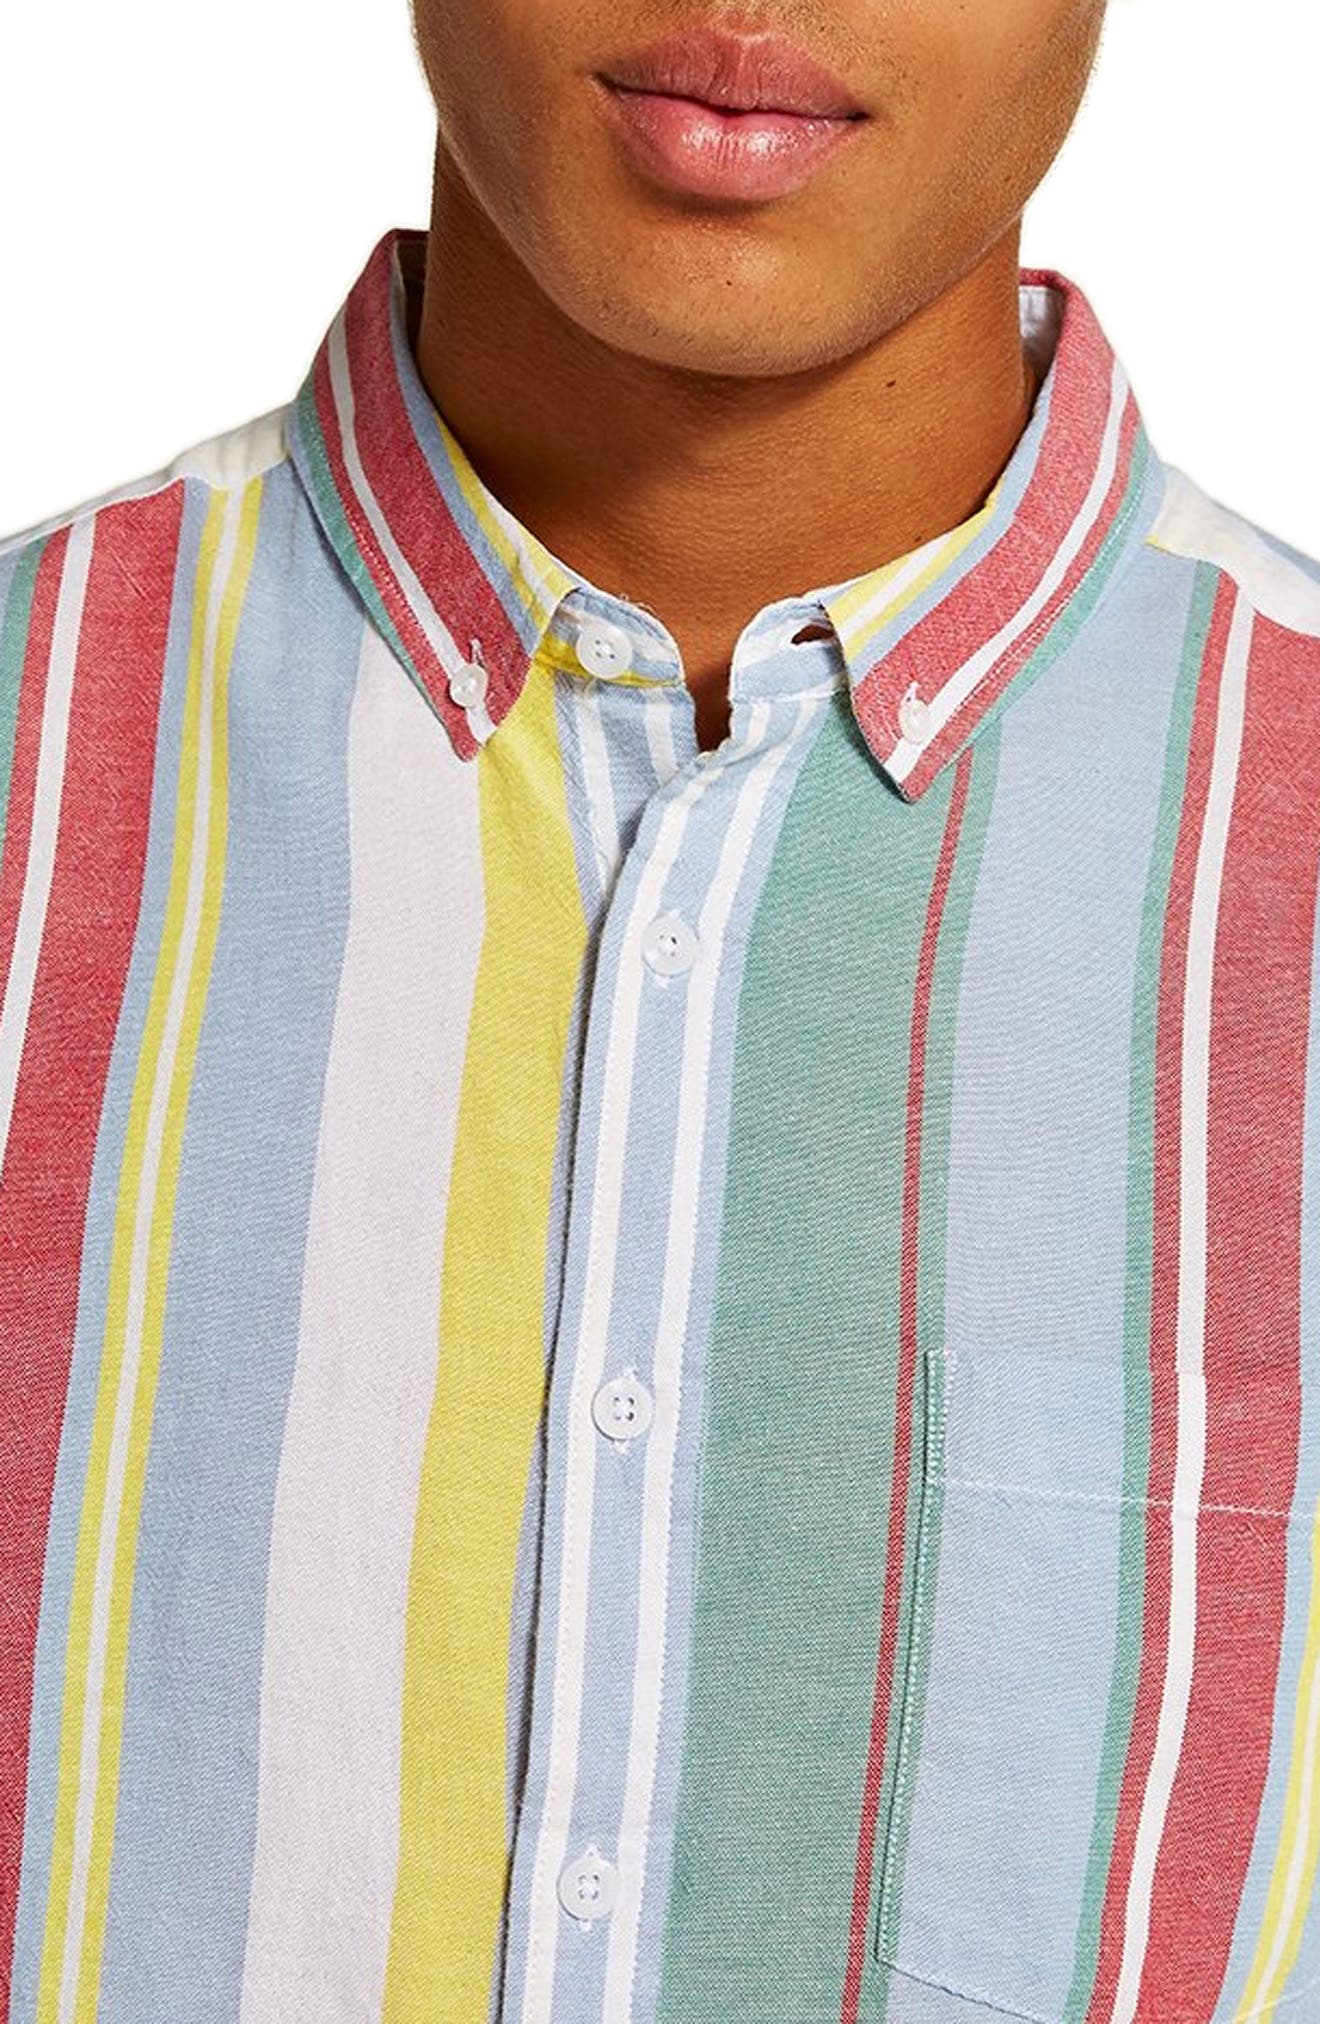 Candy Stripe Shirt,                             Main thumbnail 1, color,                             100